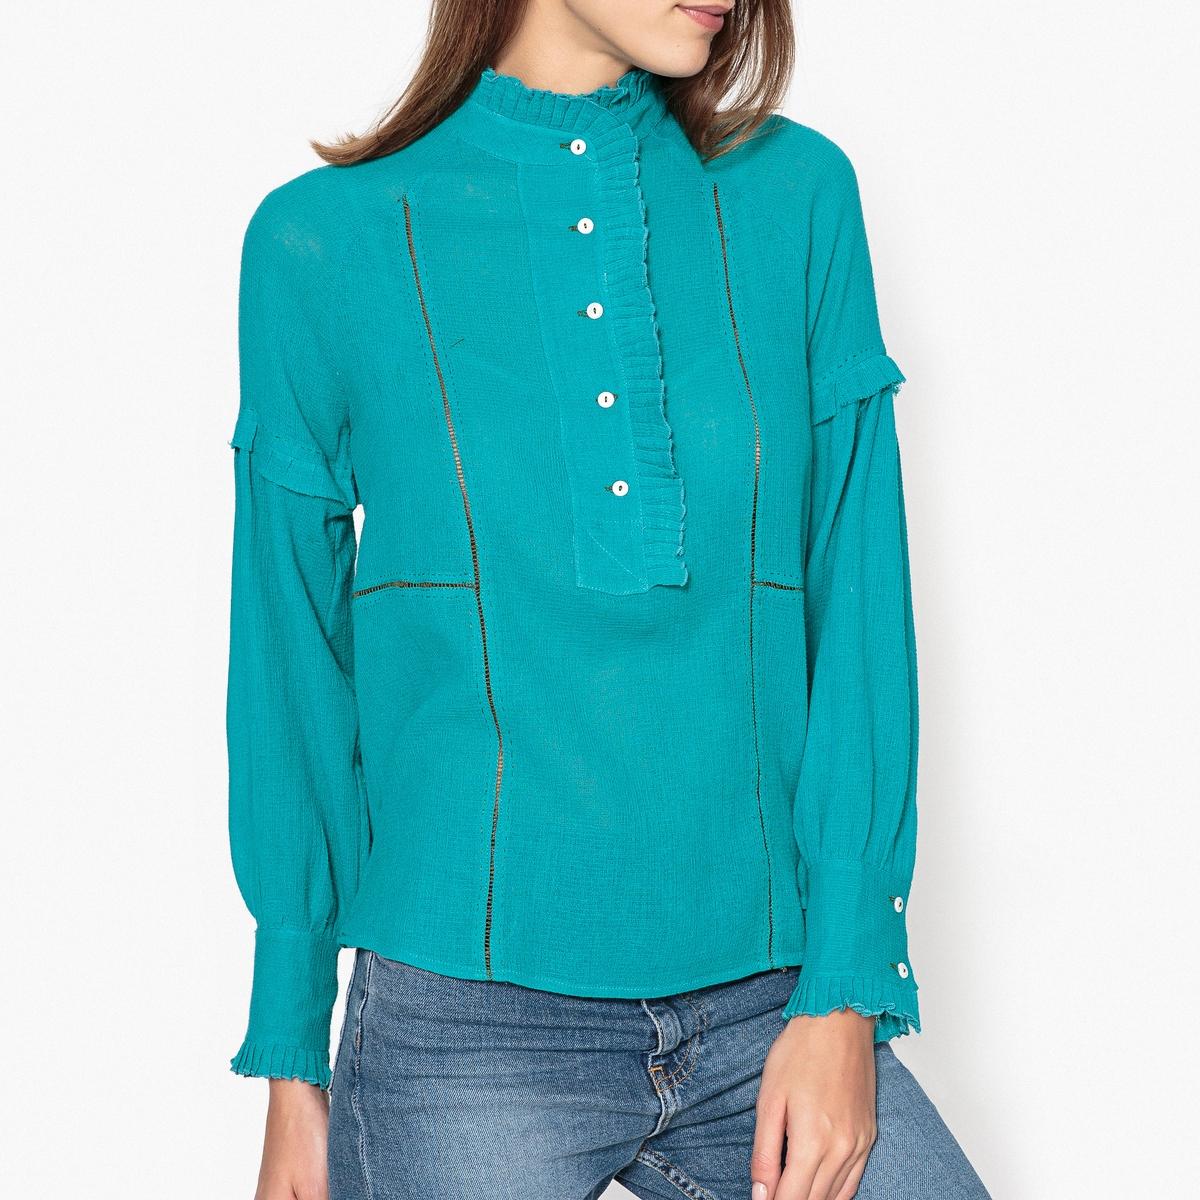 Блузка с воланами BONTY BLOUSE